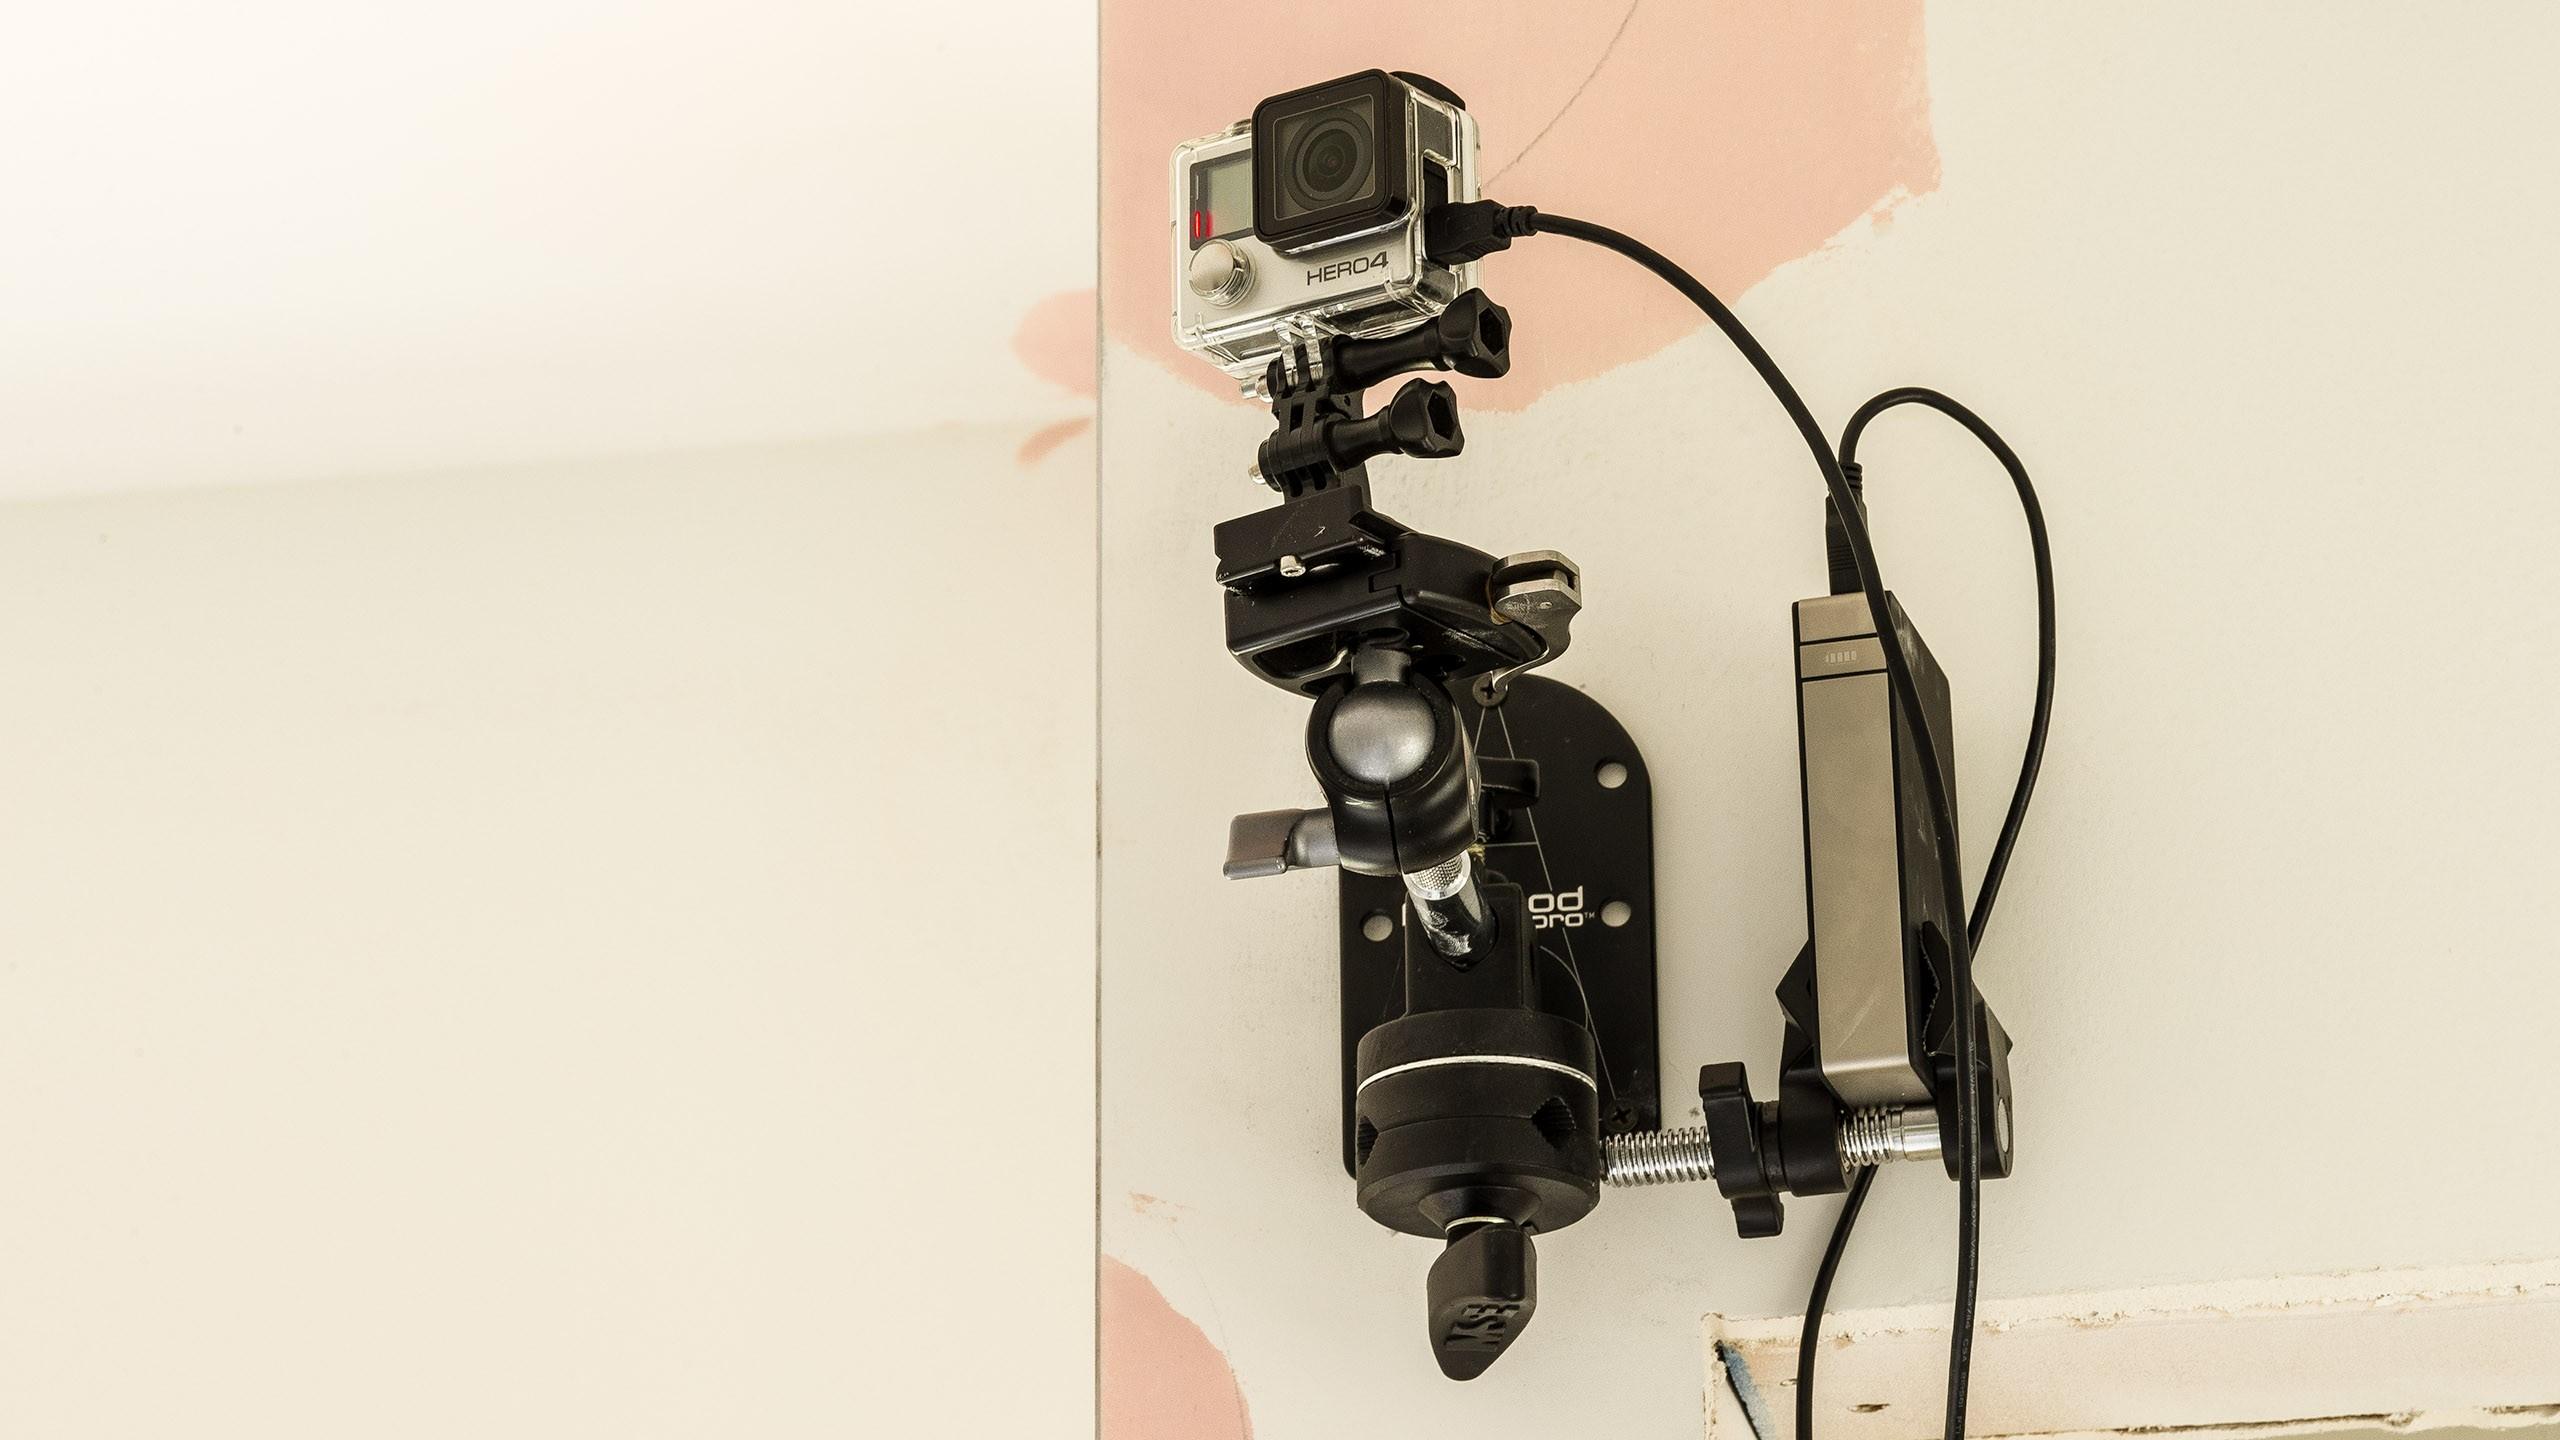 Making construction time-lapses simple — use a Platypod | Photofocus